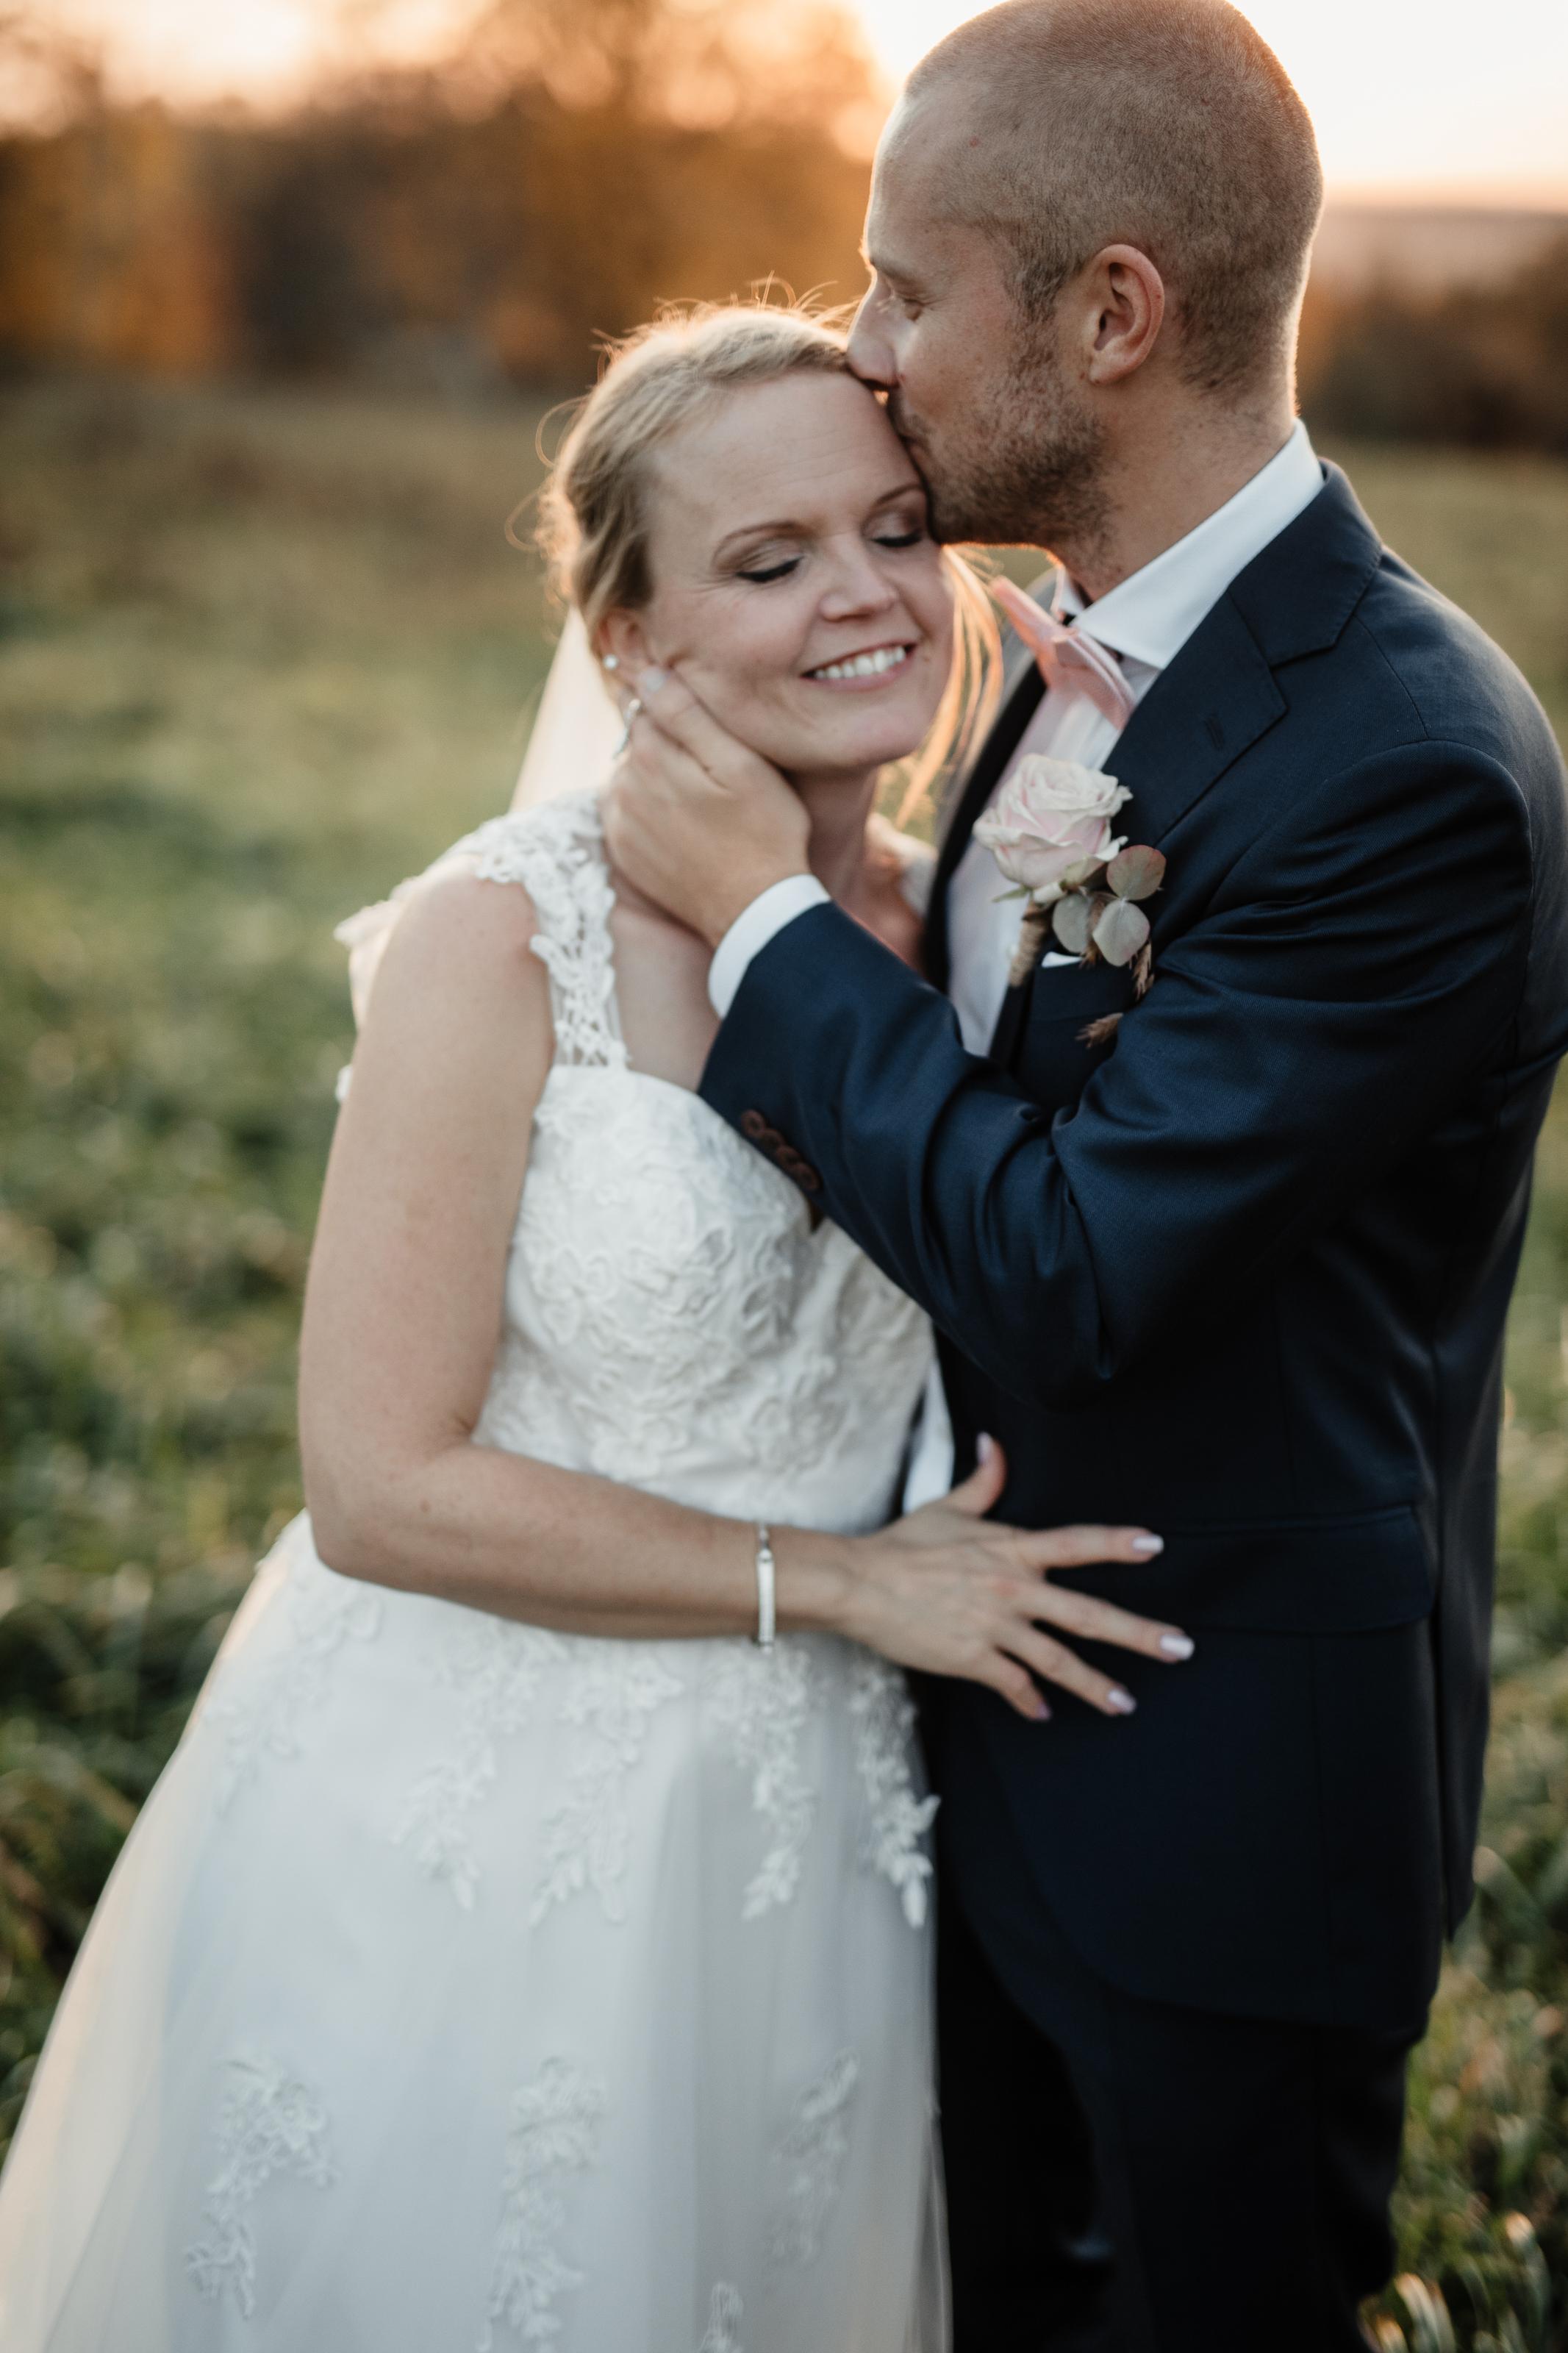 Bröllopsfotograf-Uddetorp Säteri-Höstbröllop-Fotograf Emilia- Bröllopsfotograf Borås-62.jpg